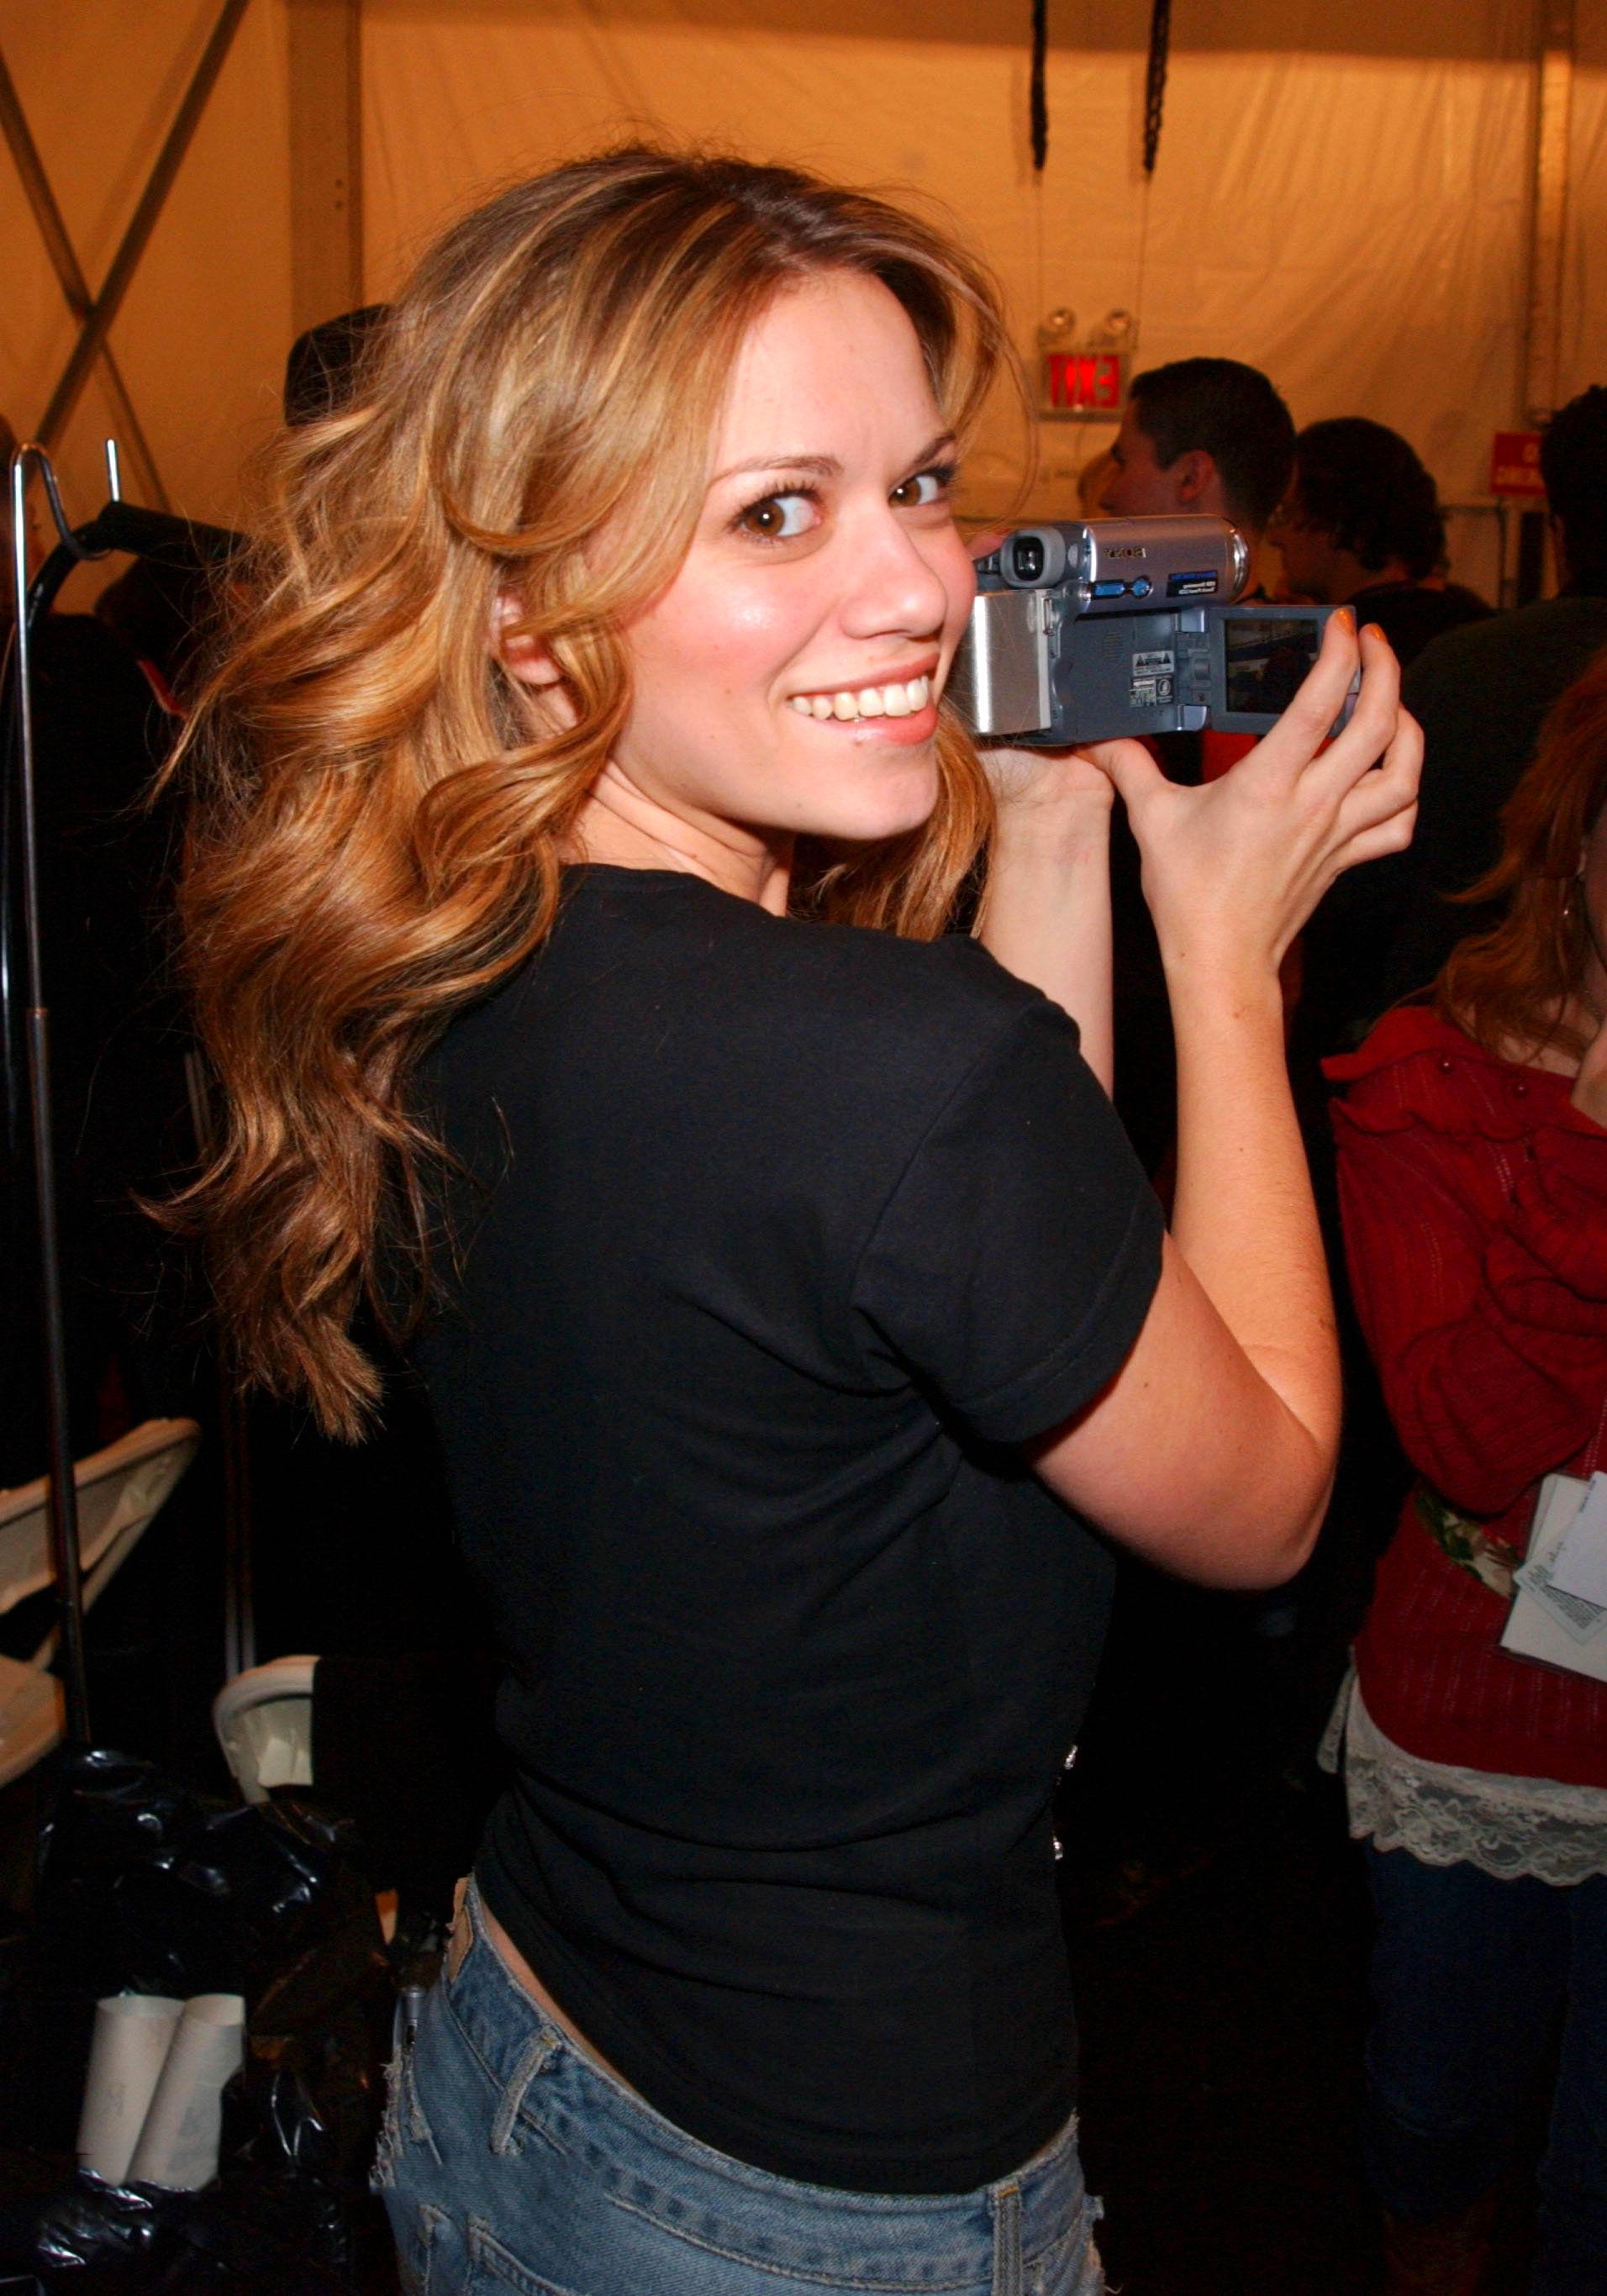 Bethany joy lenz sexy pics